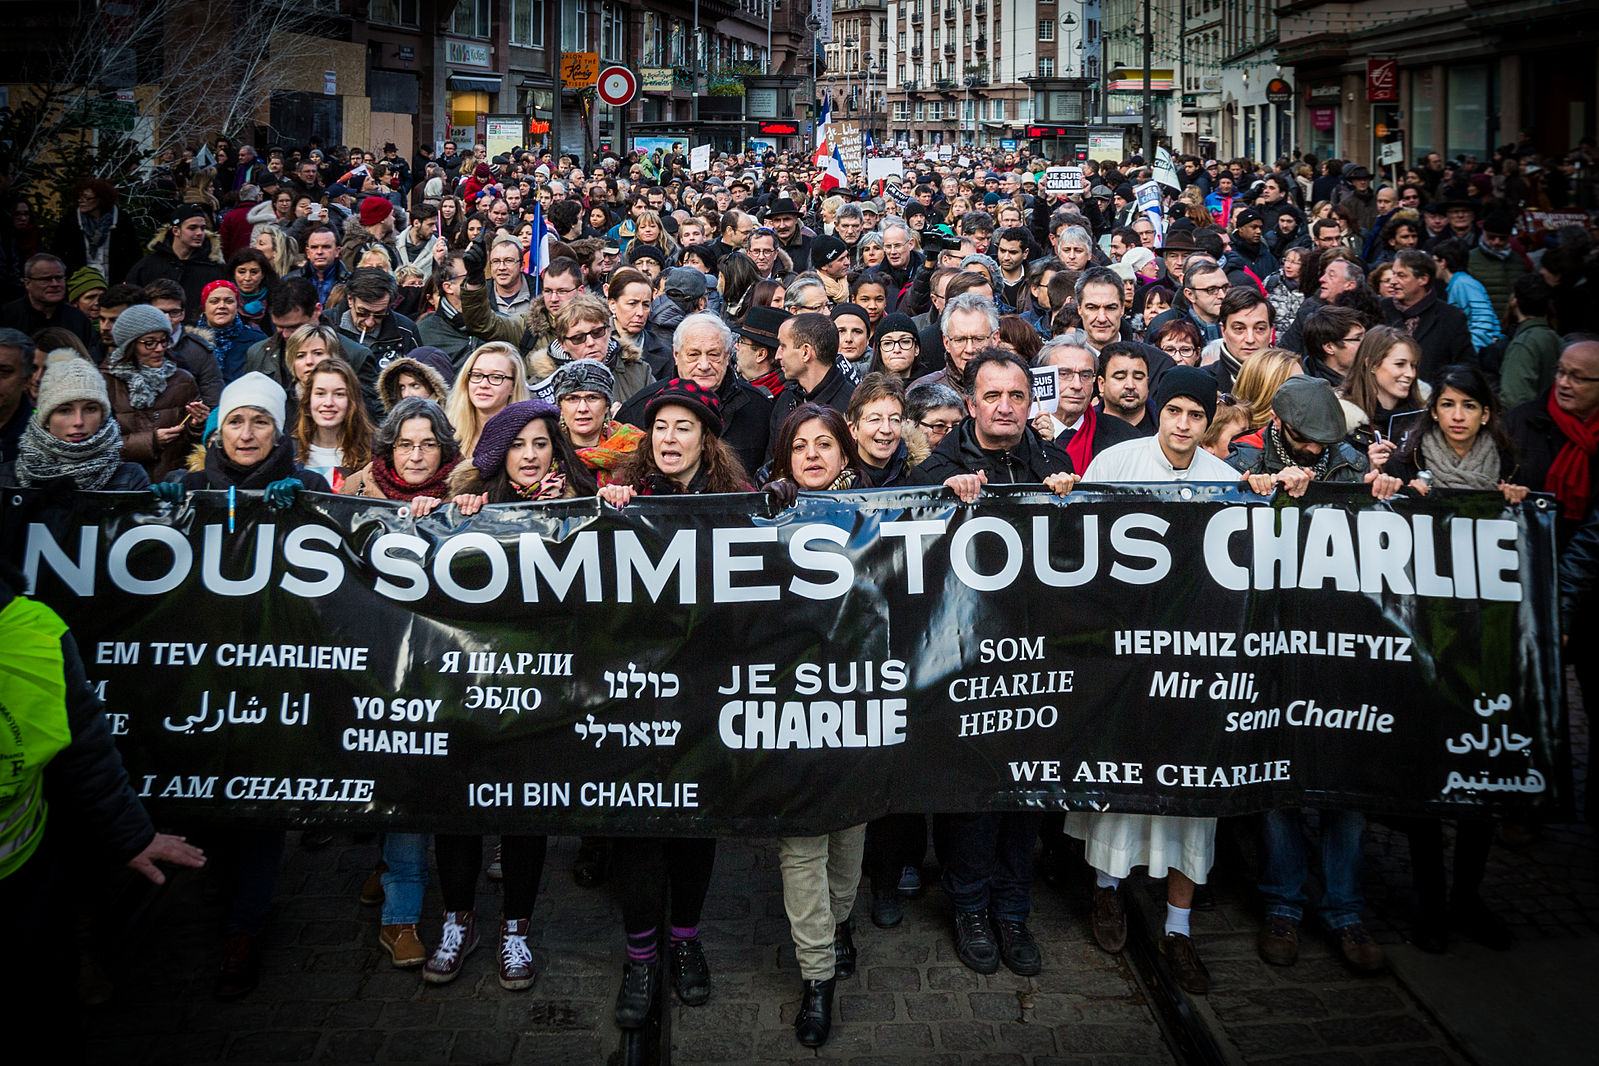 Markering i Strasbourg for Charlie Hebdo i 2015. Foto: Claude Truong-Ngoc / Wikimedia Commons